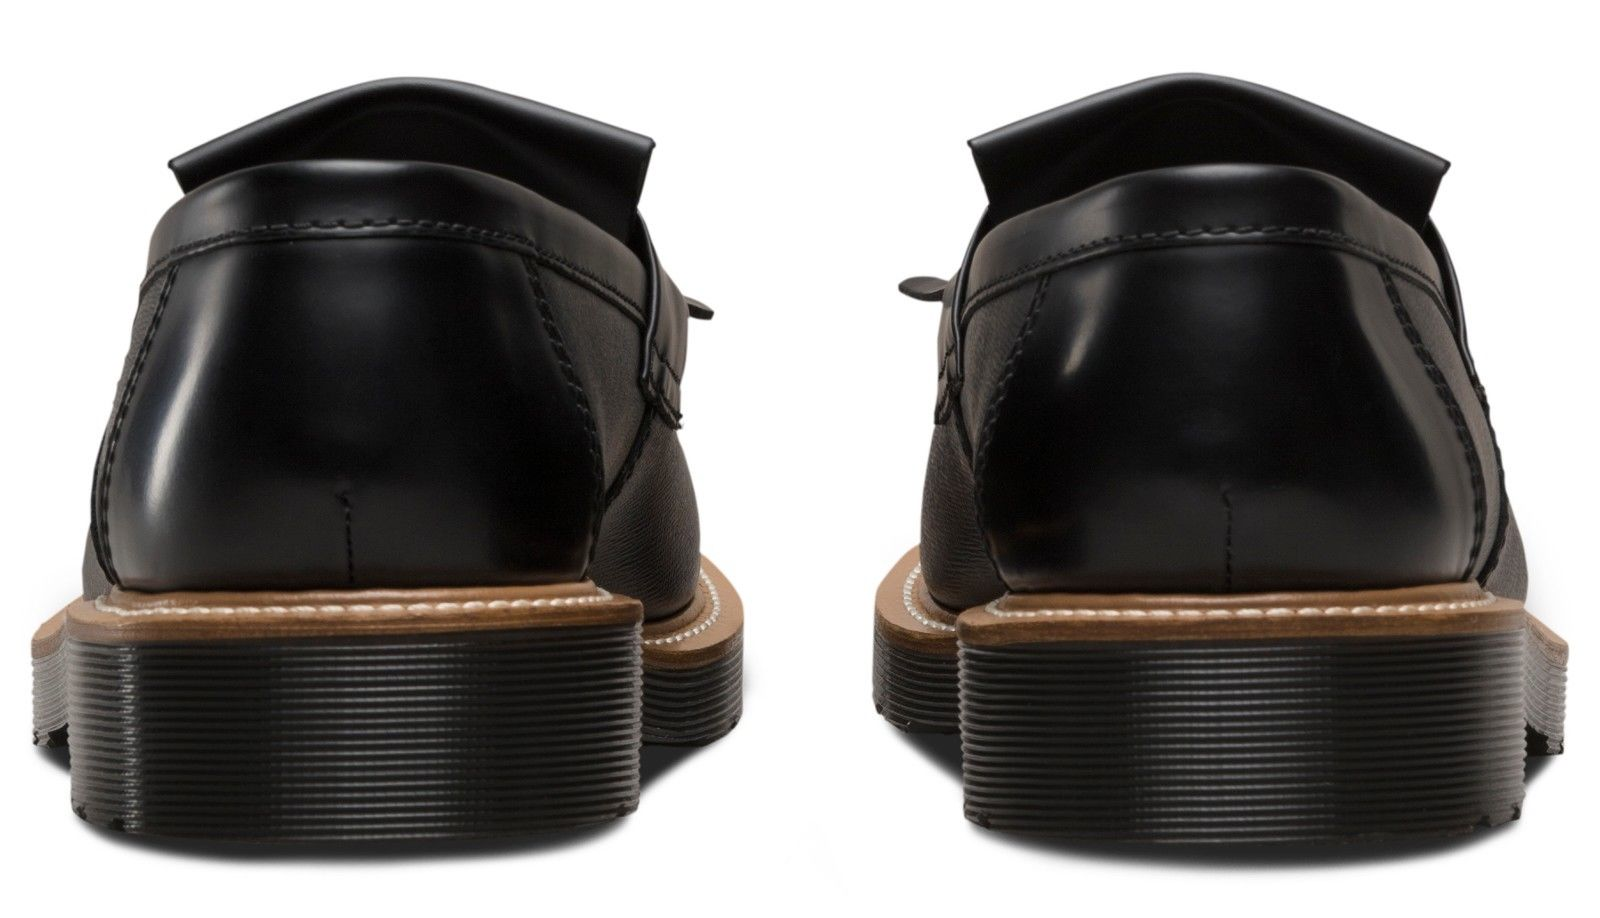 Dr Martens smooth 23163001 Adrian straw black smooth Martens loafer sizes 6-13UK 17c66b